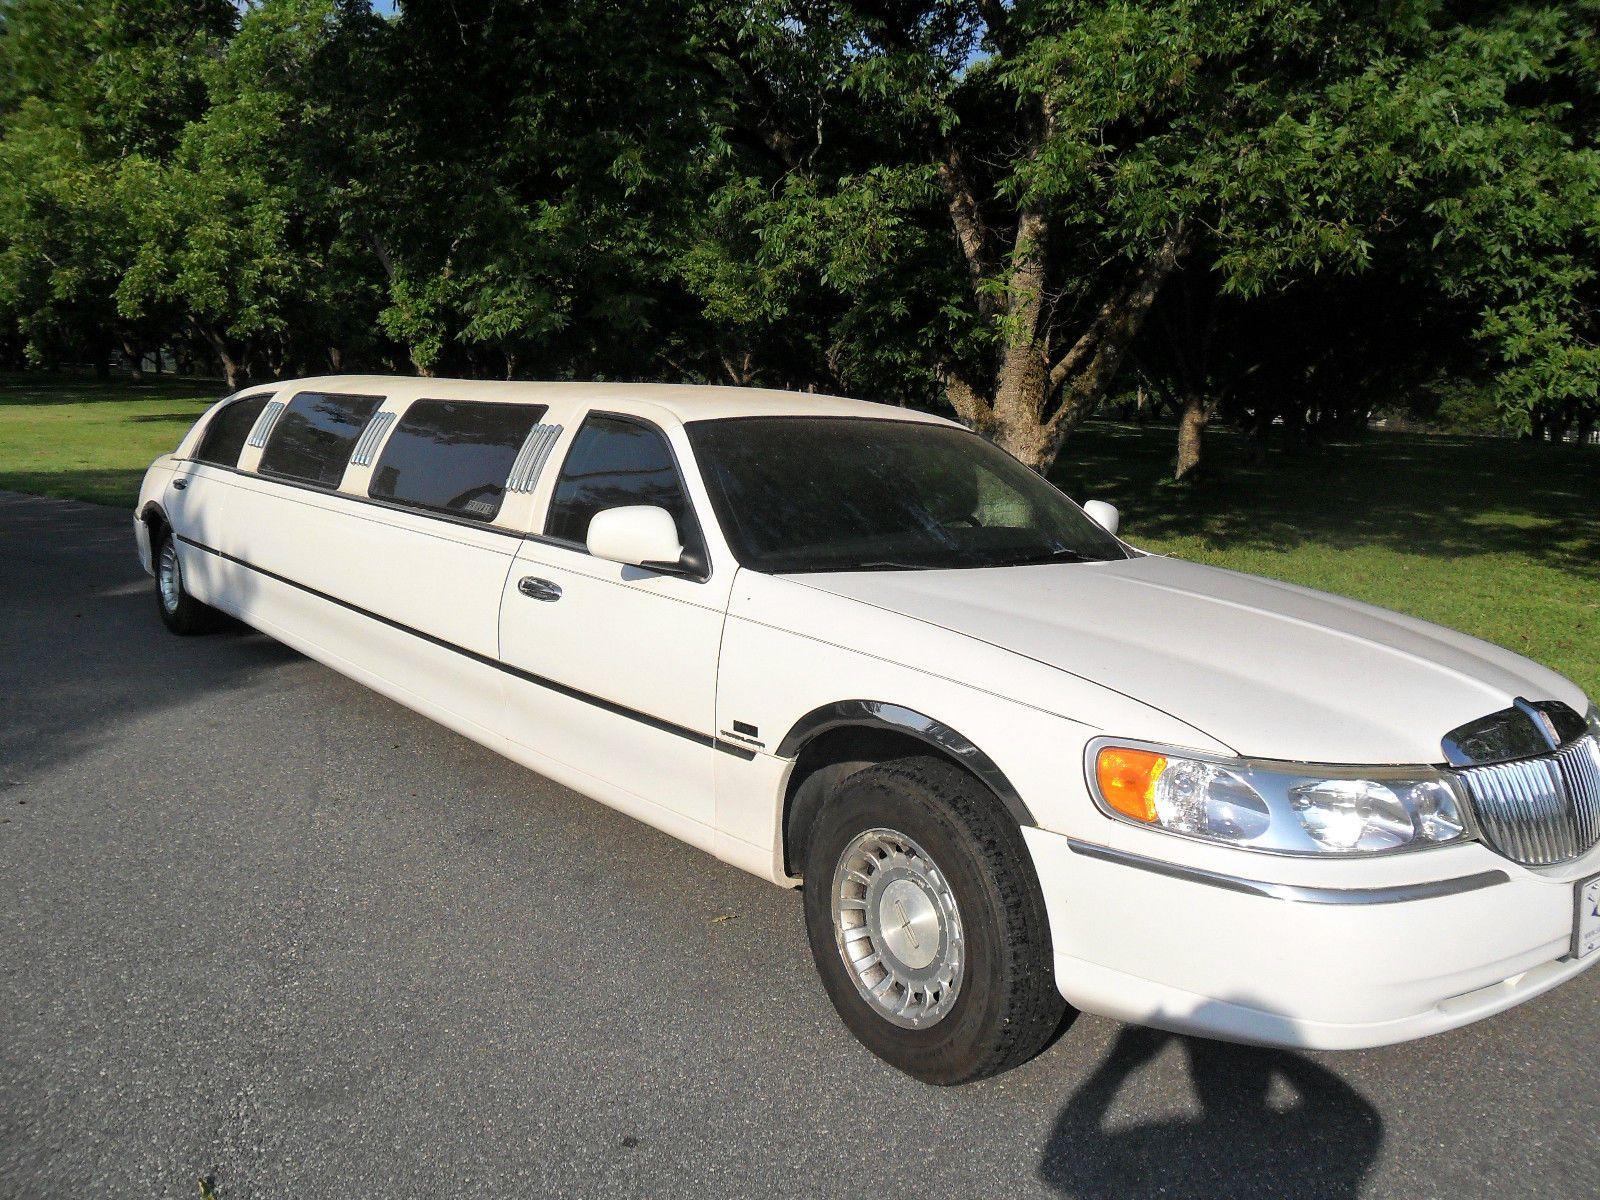 Family Limo 1999 Lincoln Town Car Executive Limousine Limousines